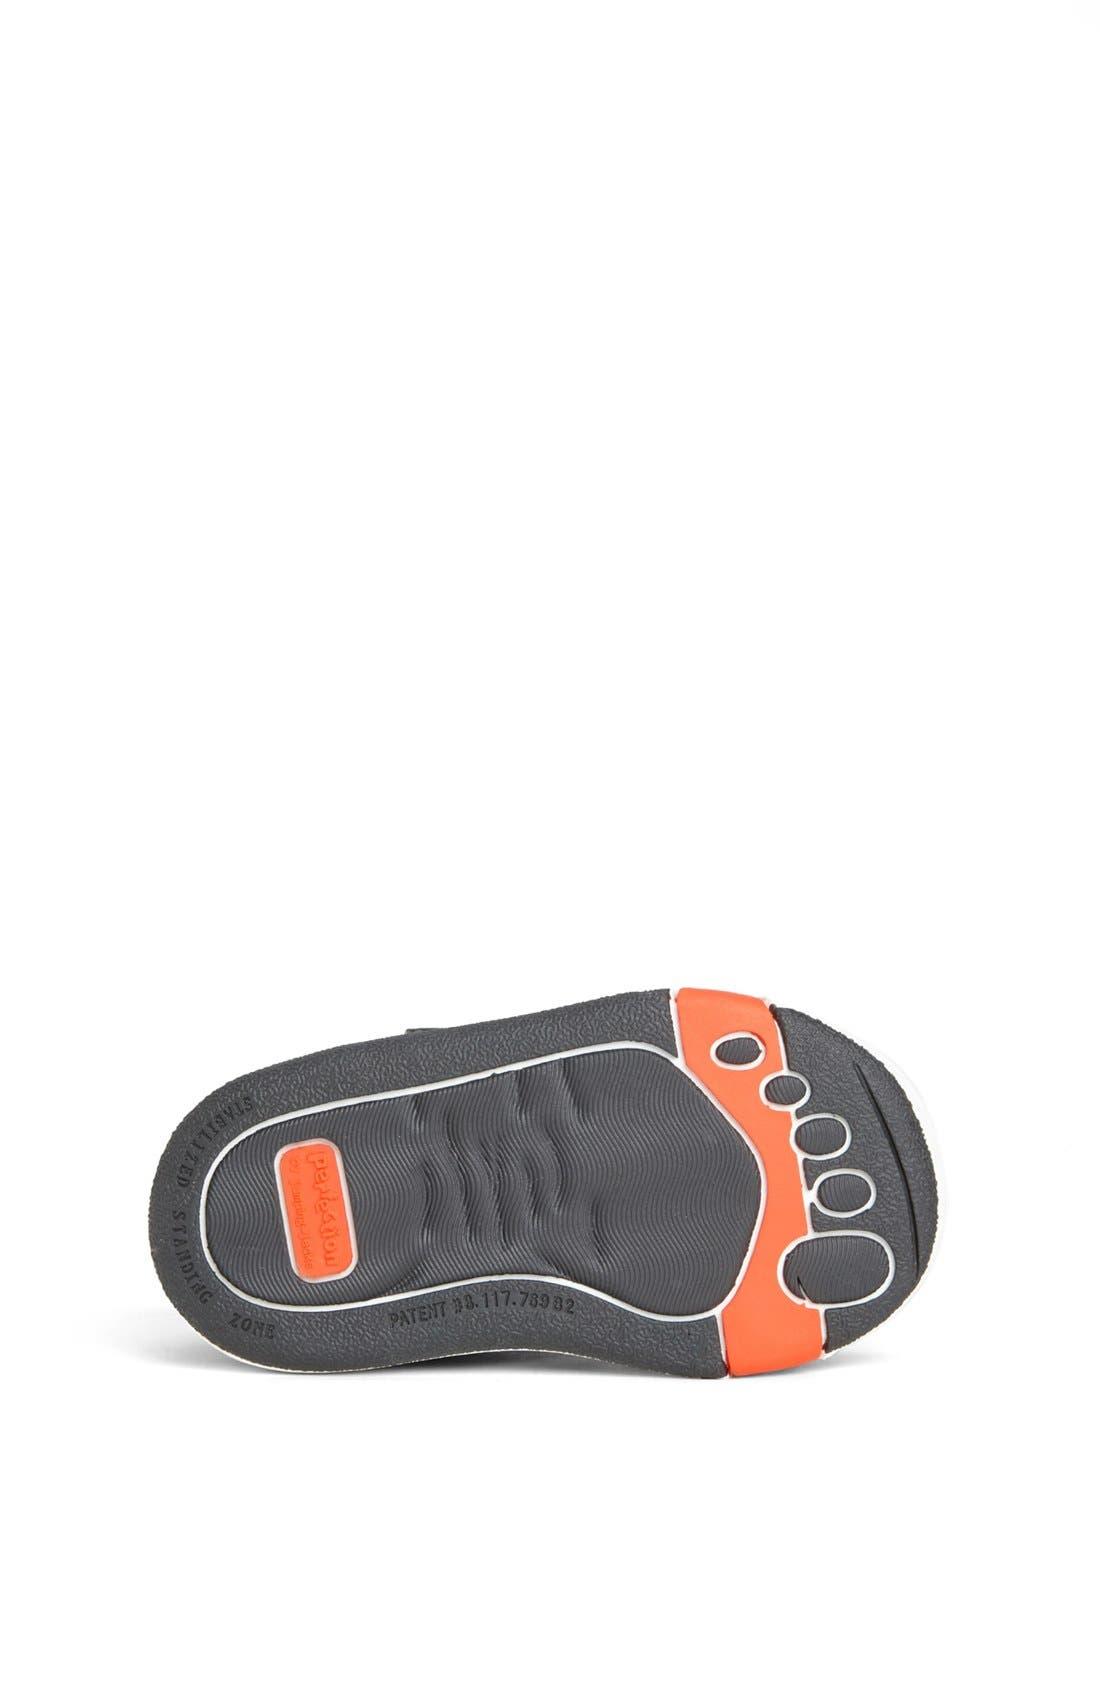 Alternate Image 4  - Jumping Jacks 'Finish Line' Sneaker (Baby, Walker & Toddler)